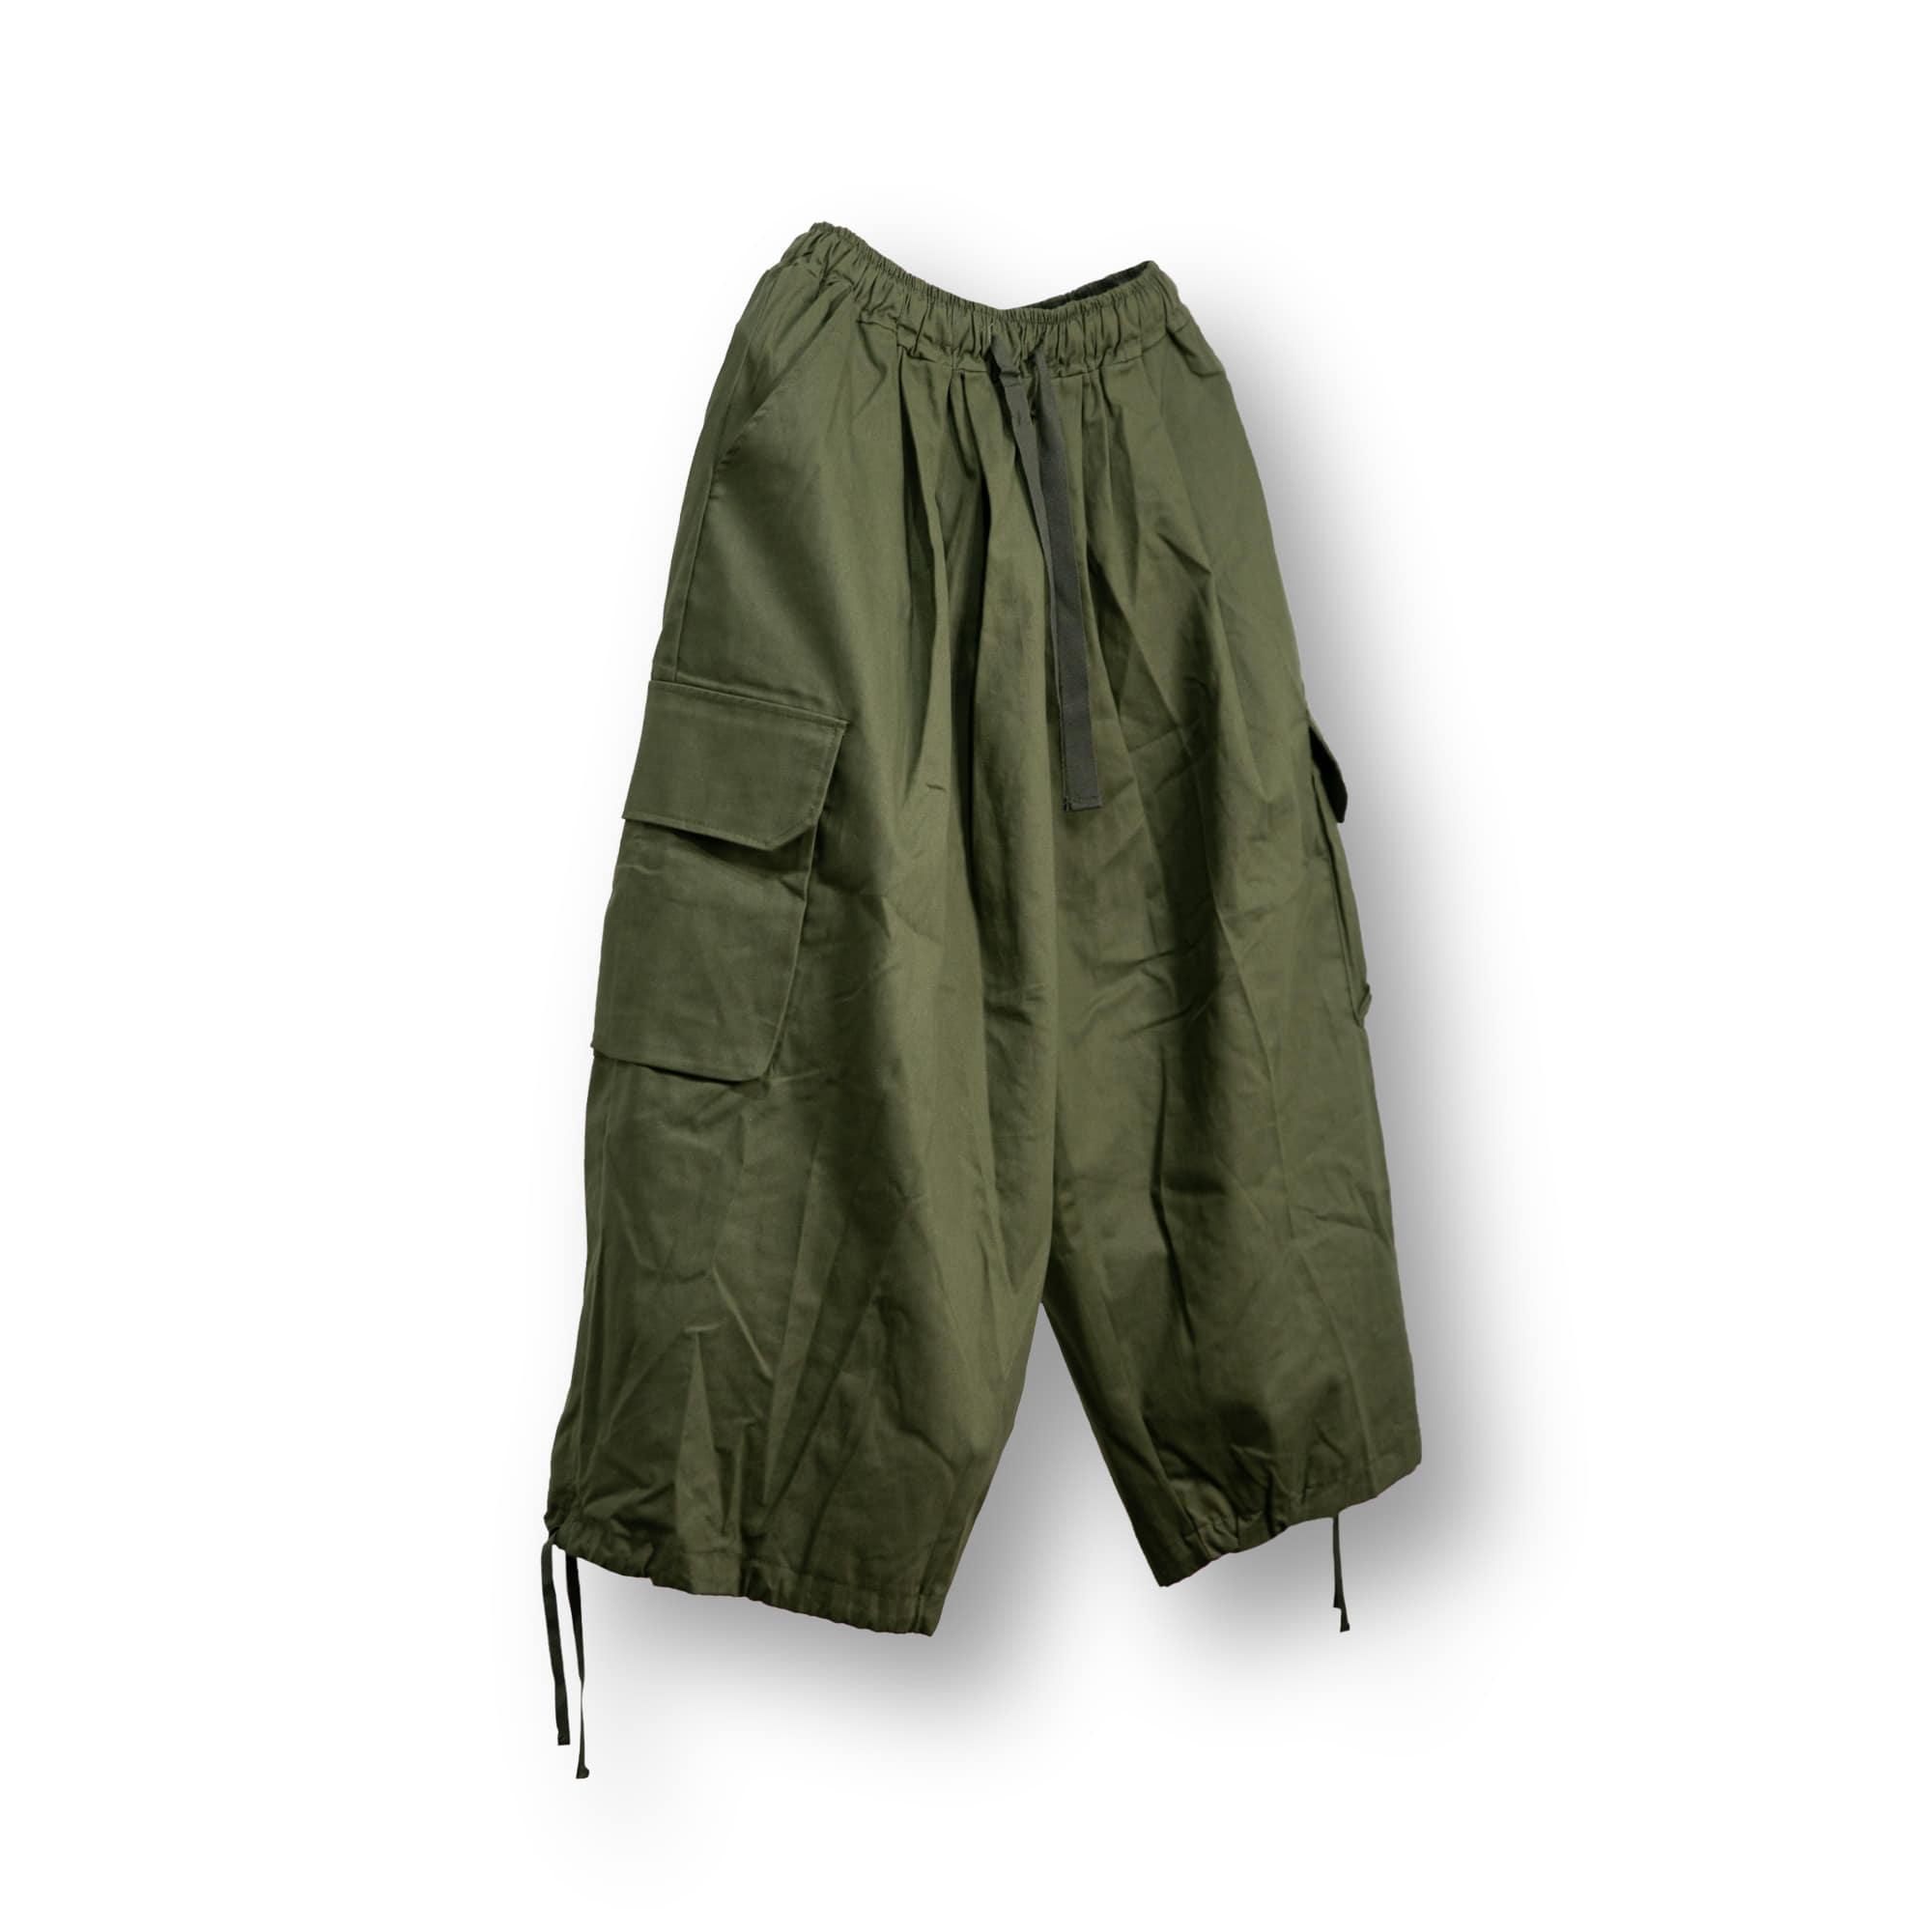 Cotton Cargo Strap Balloon Pants - Khaki